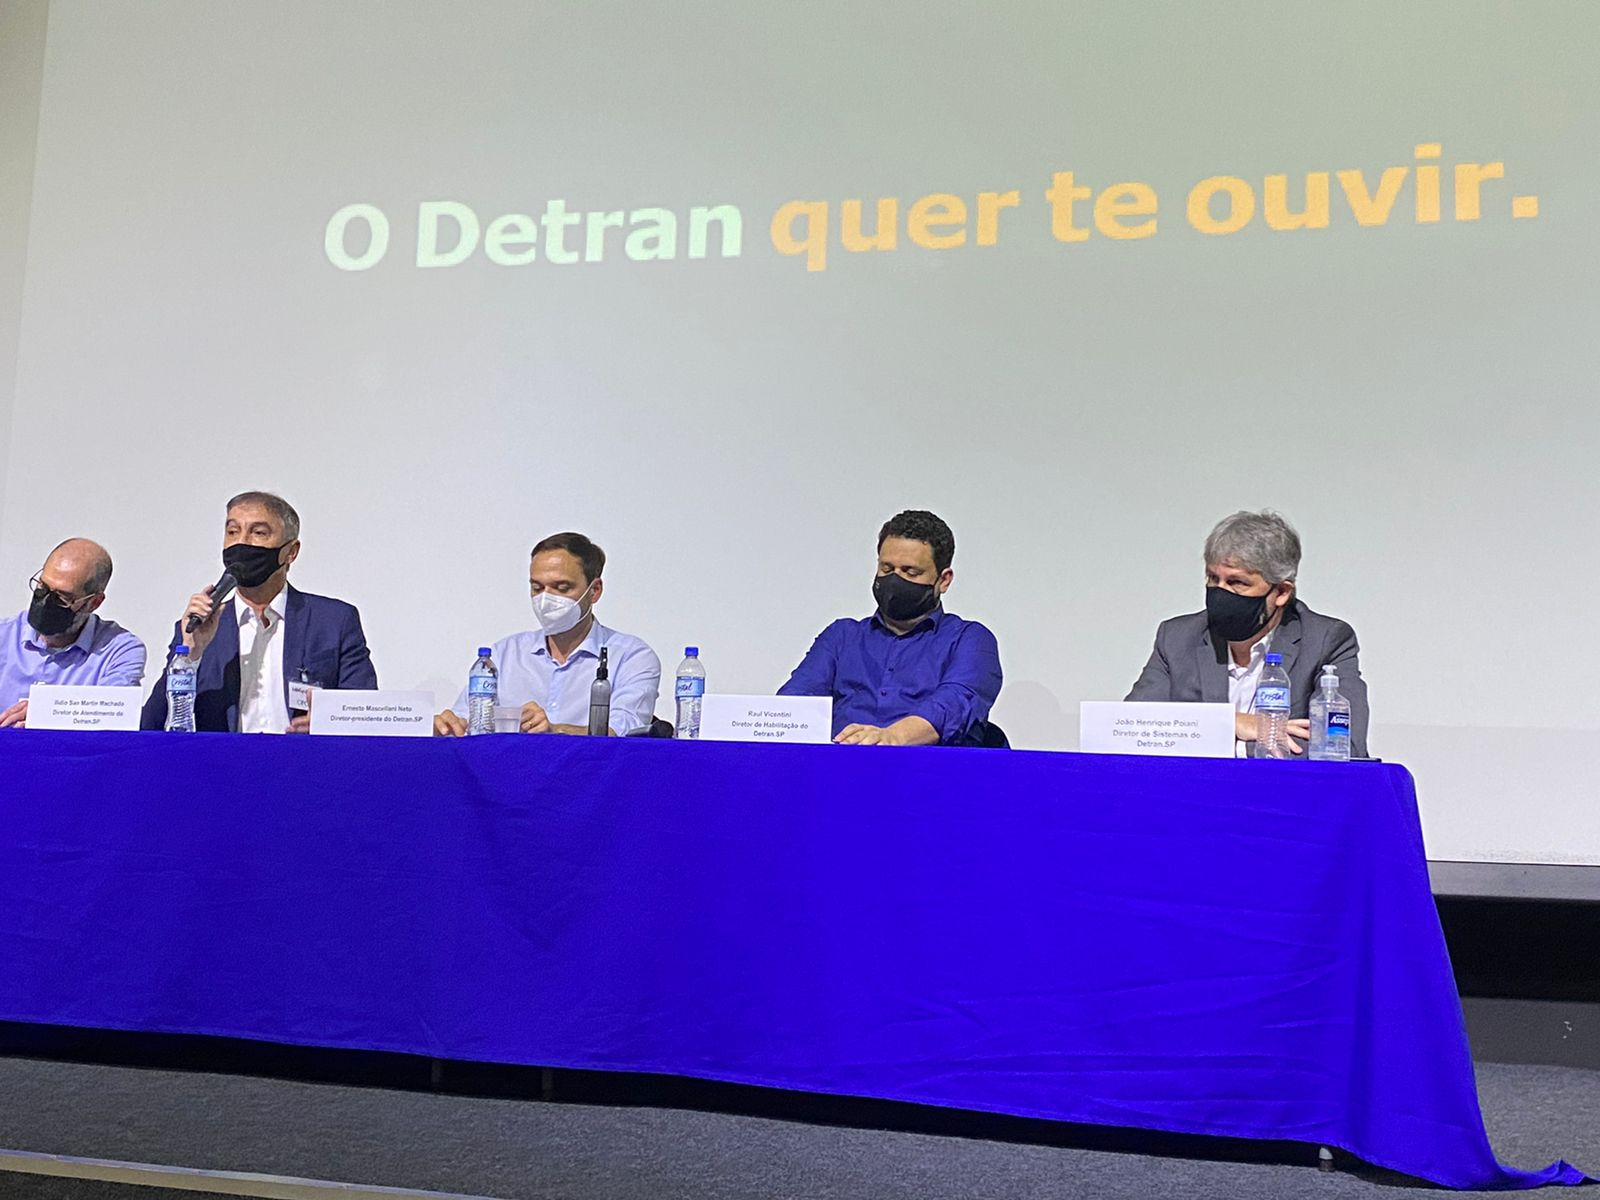 Foto: (aplicativo TSE - webstories / Reprodução/TV Globo )